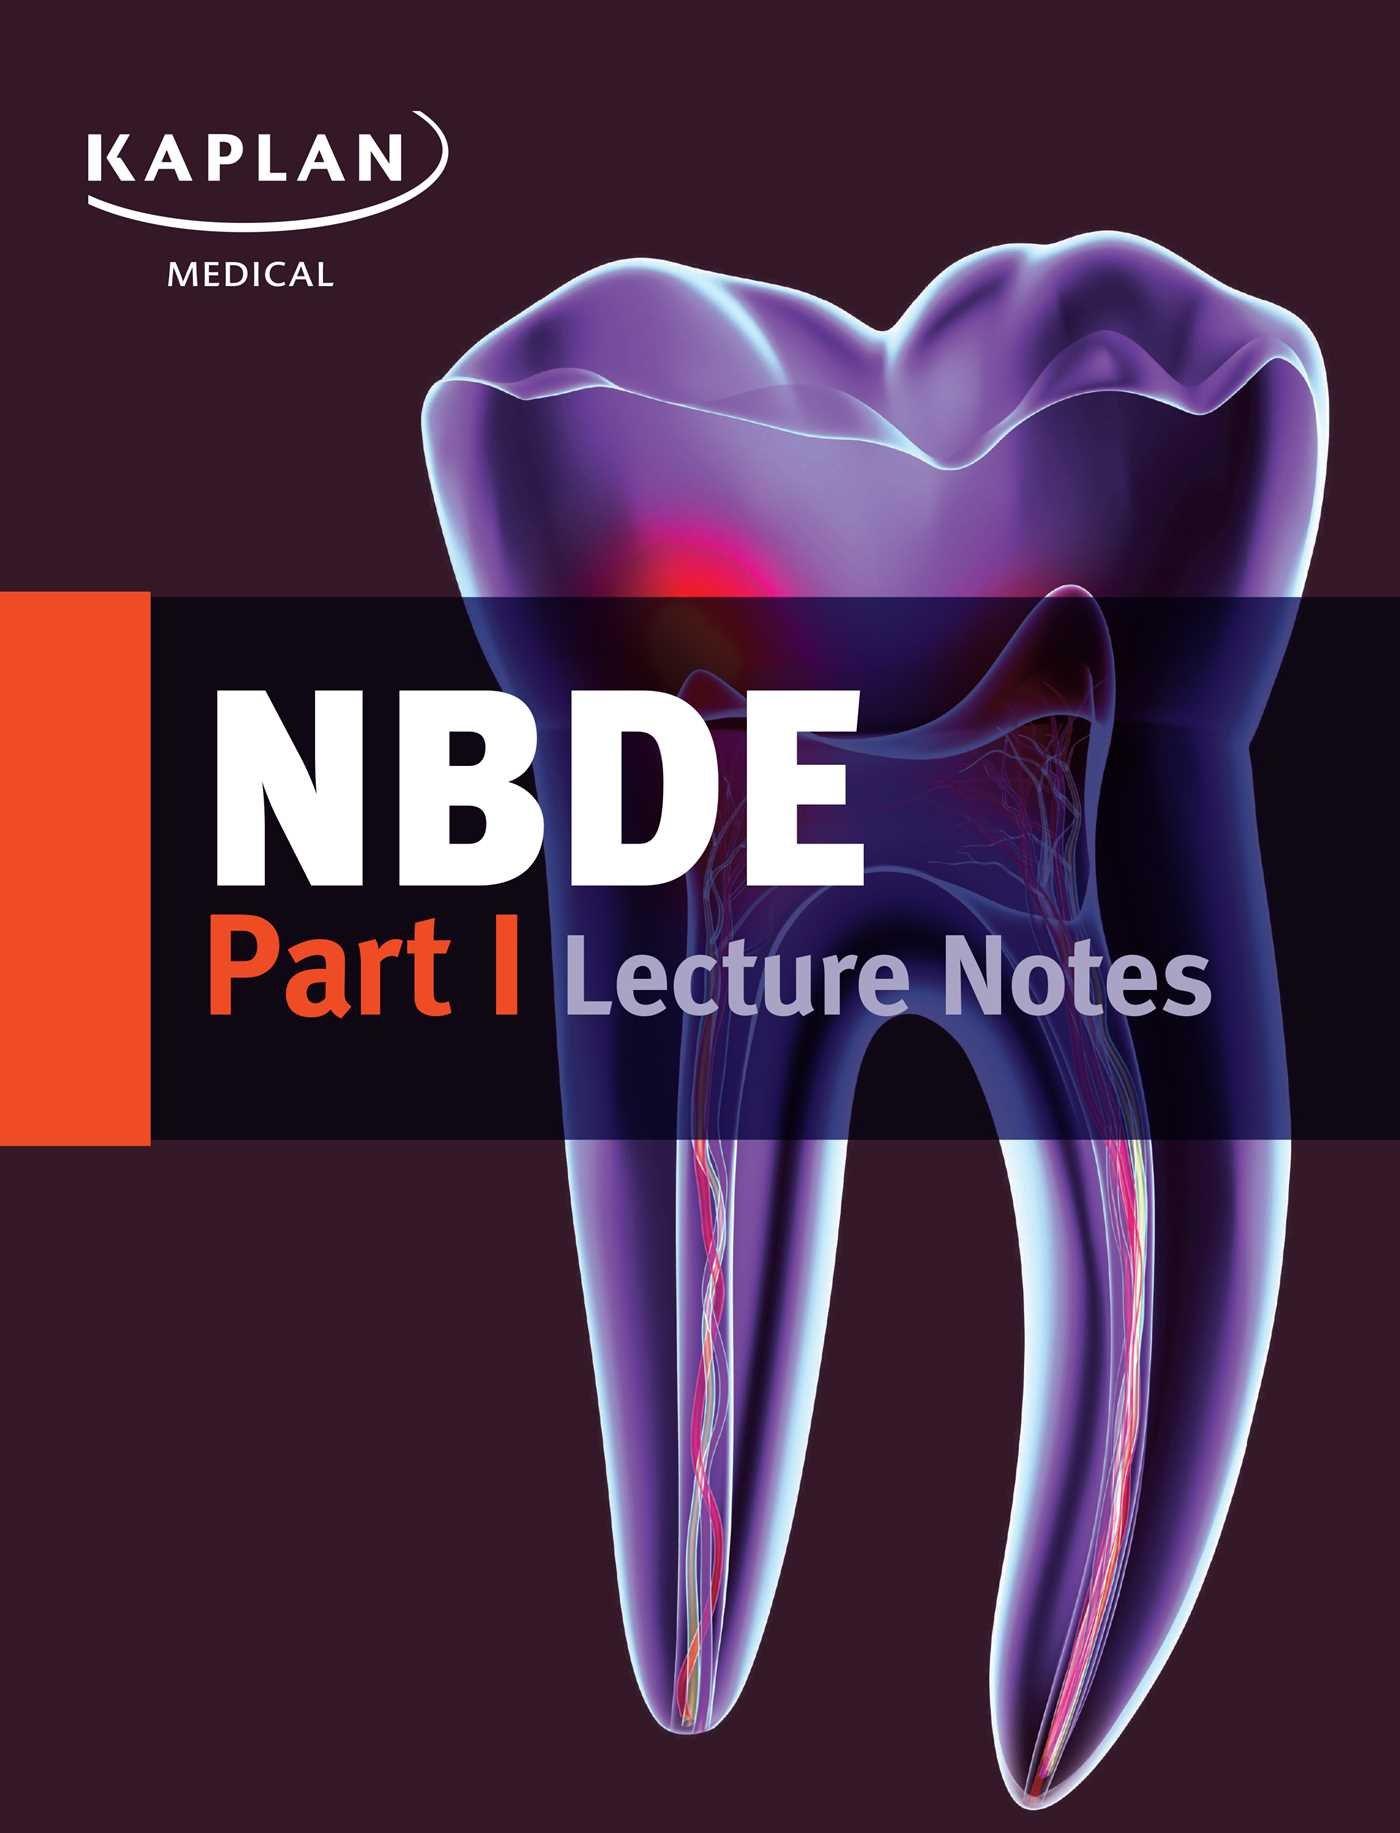 Nbde Part I Lecture Notes (Kaplan Test Prep): Amazon.co.uk: Kaplan Medical:  9781506207834: Books